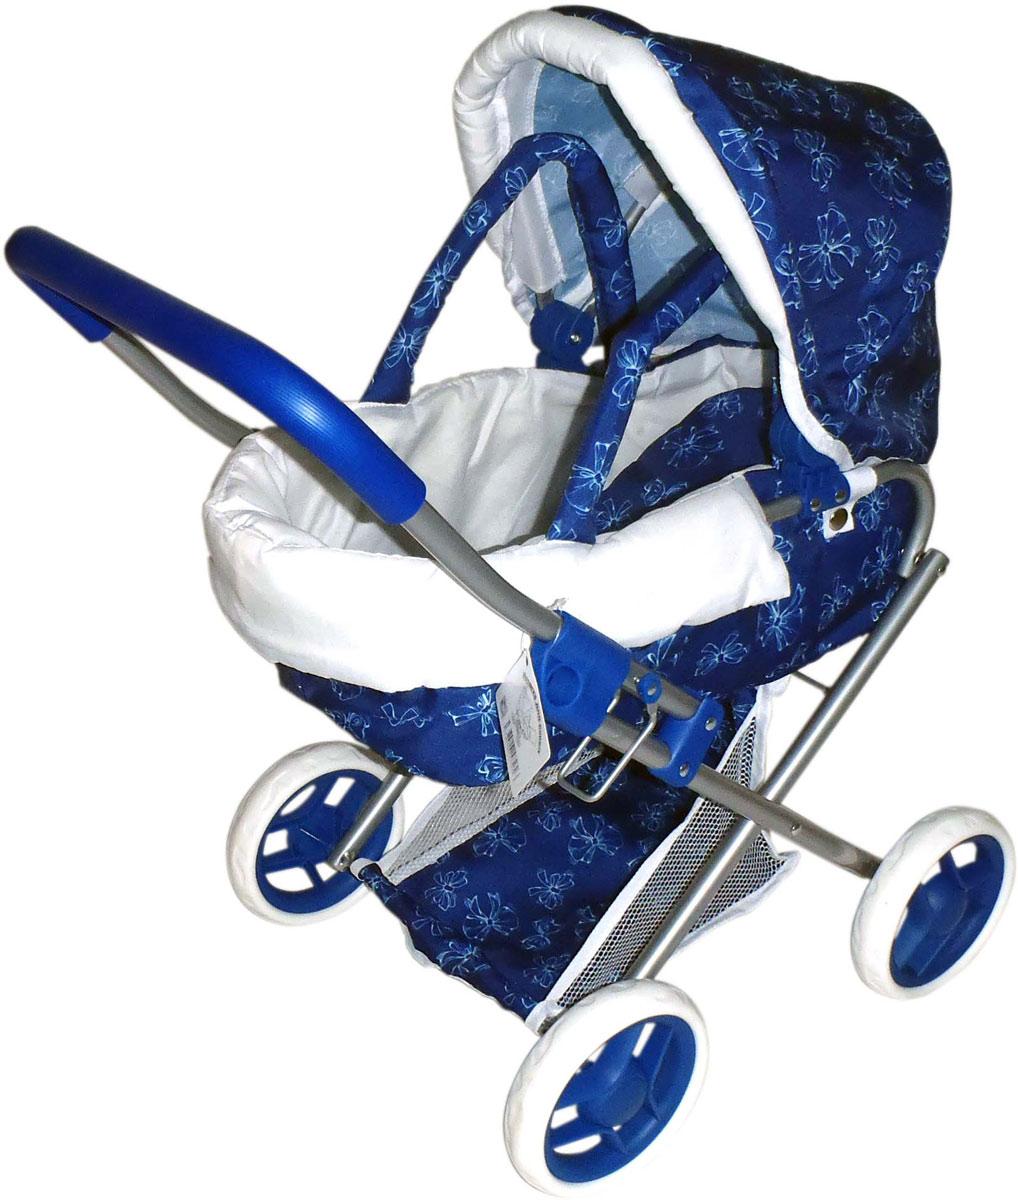 1toy Транспорт для кукол Коляска-люлька цвет синий Т57326 коляска люлька для кукол синий белый принтт57326